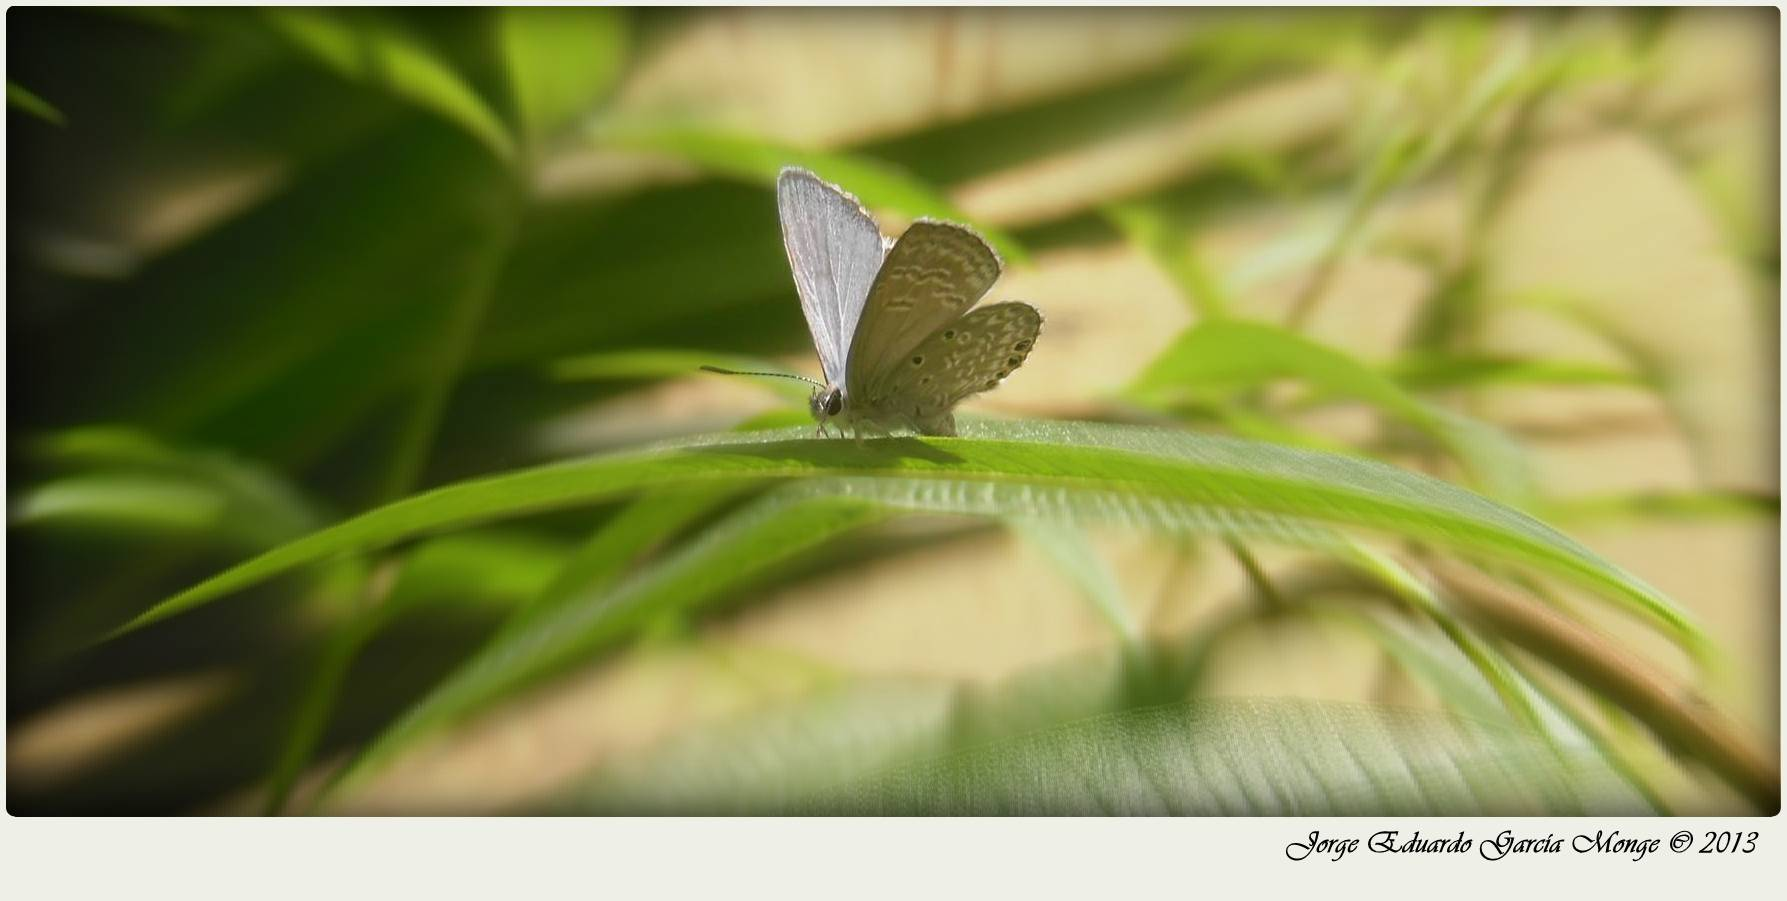 Una hermosa mariposa